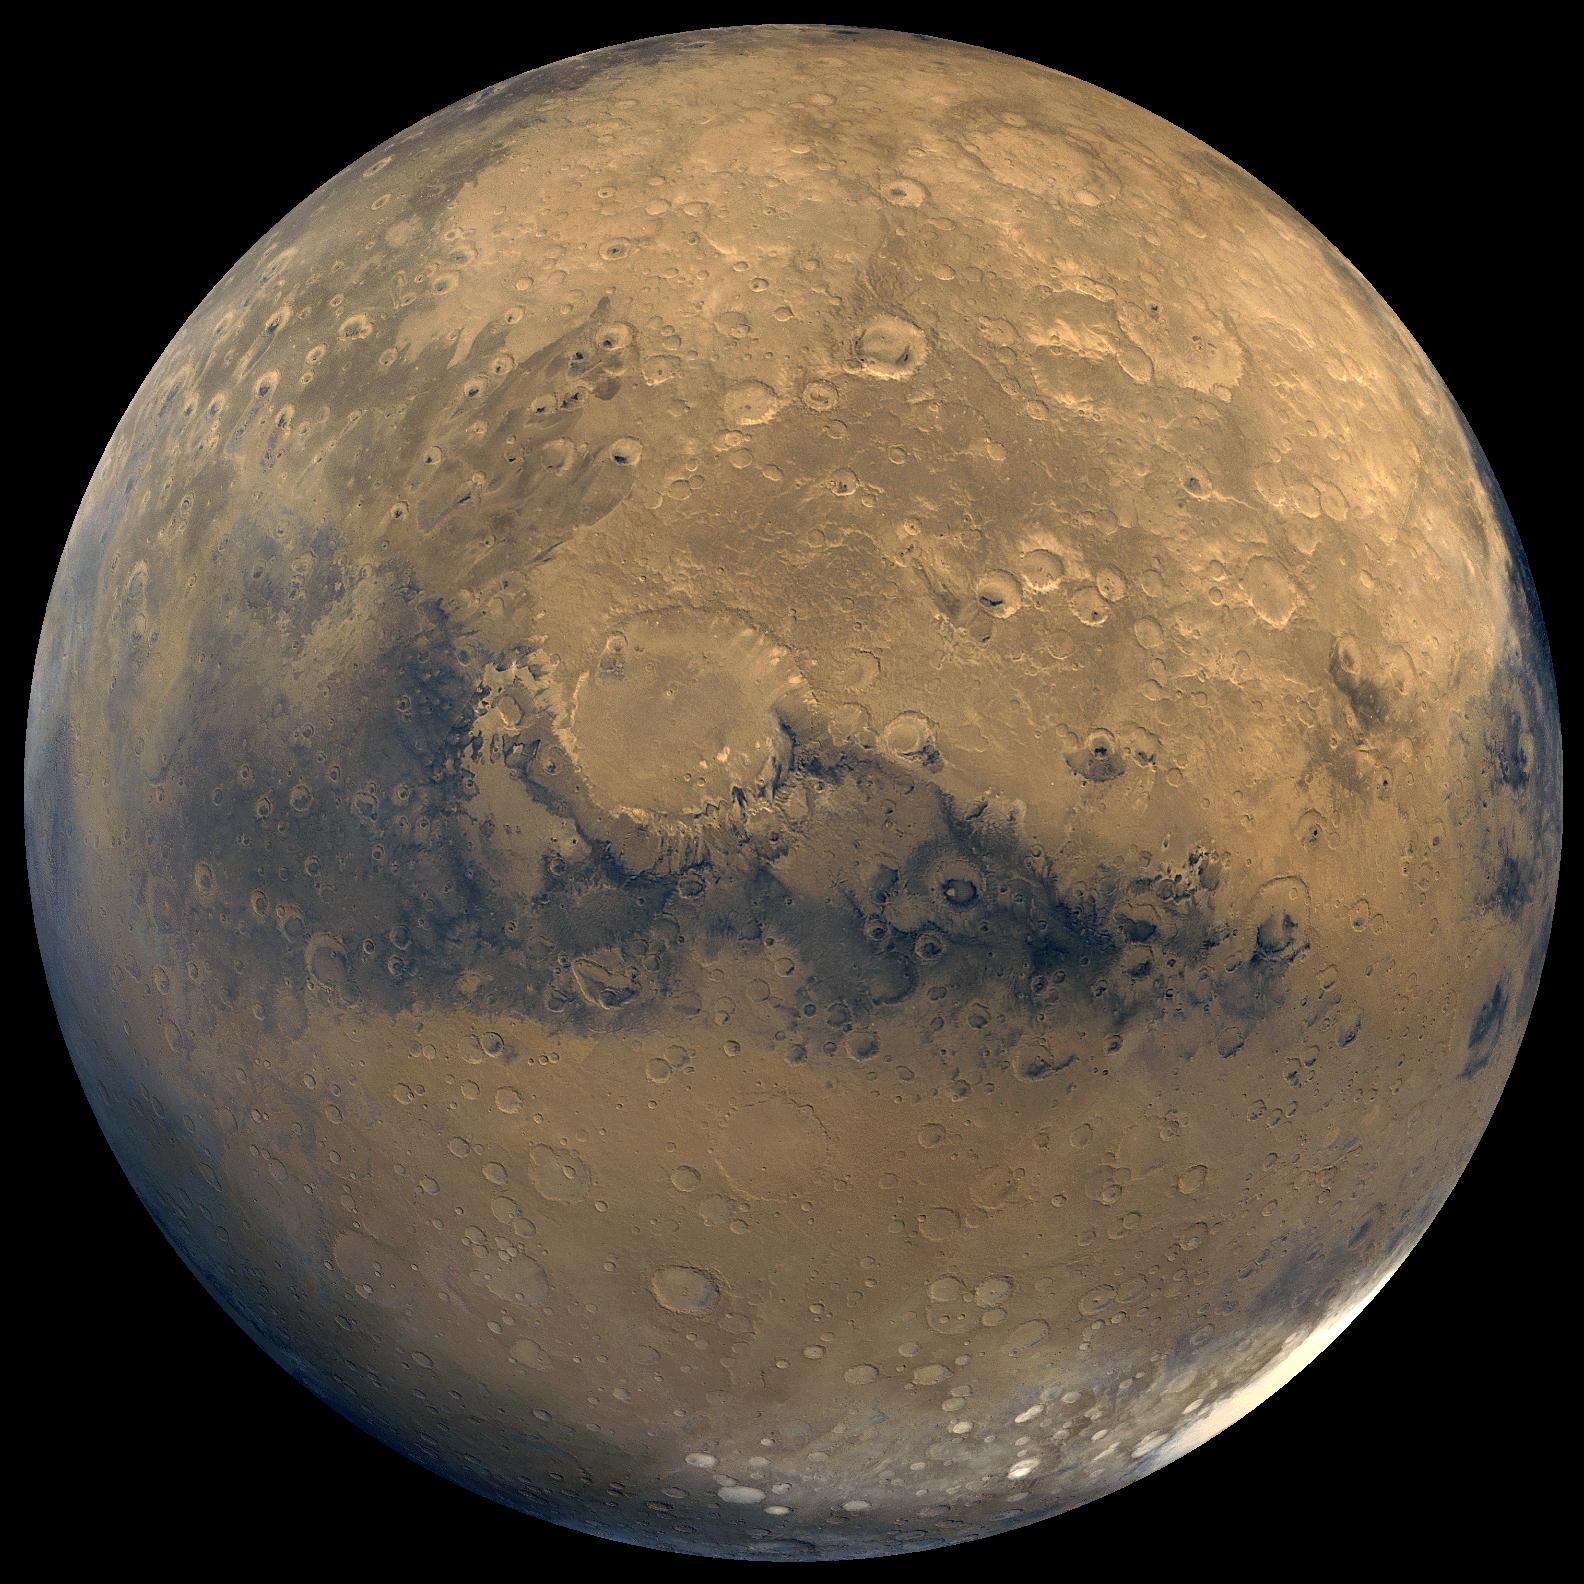 mars planet 2moons - photo #38